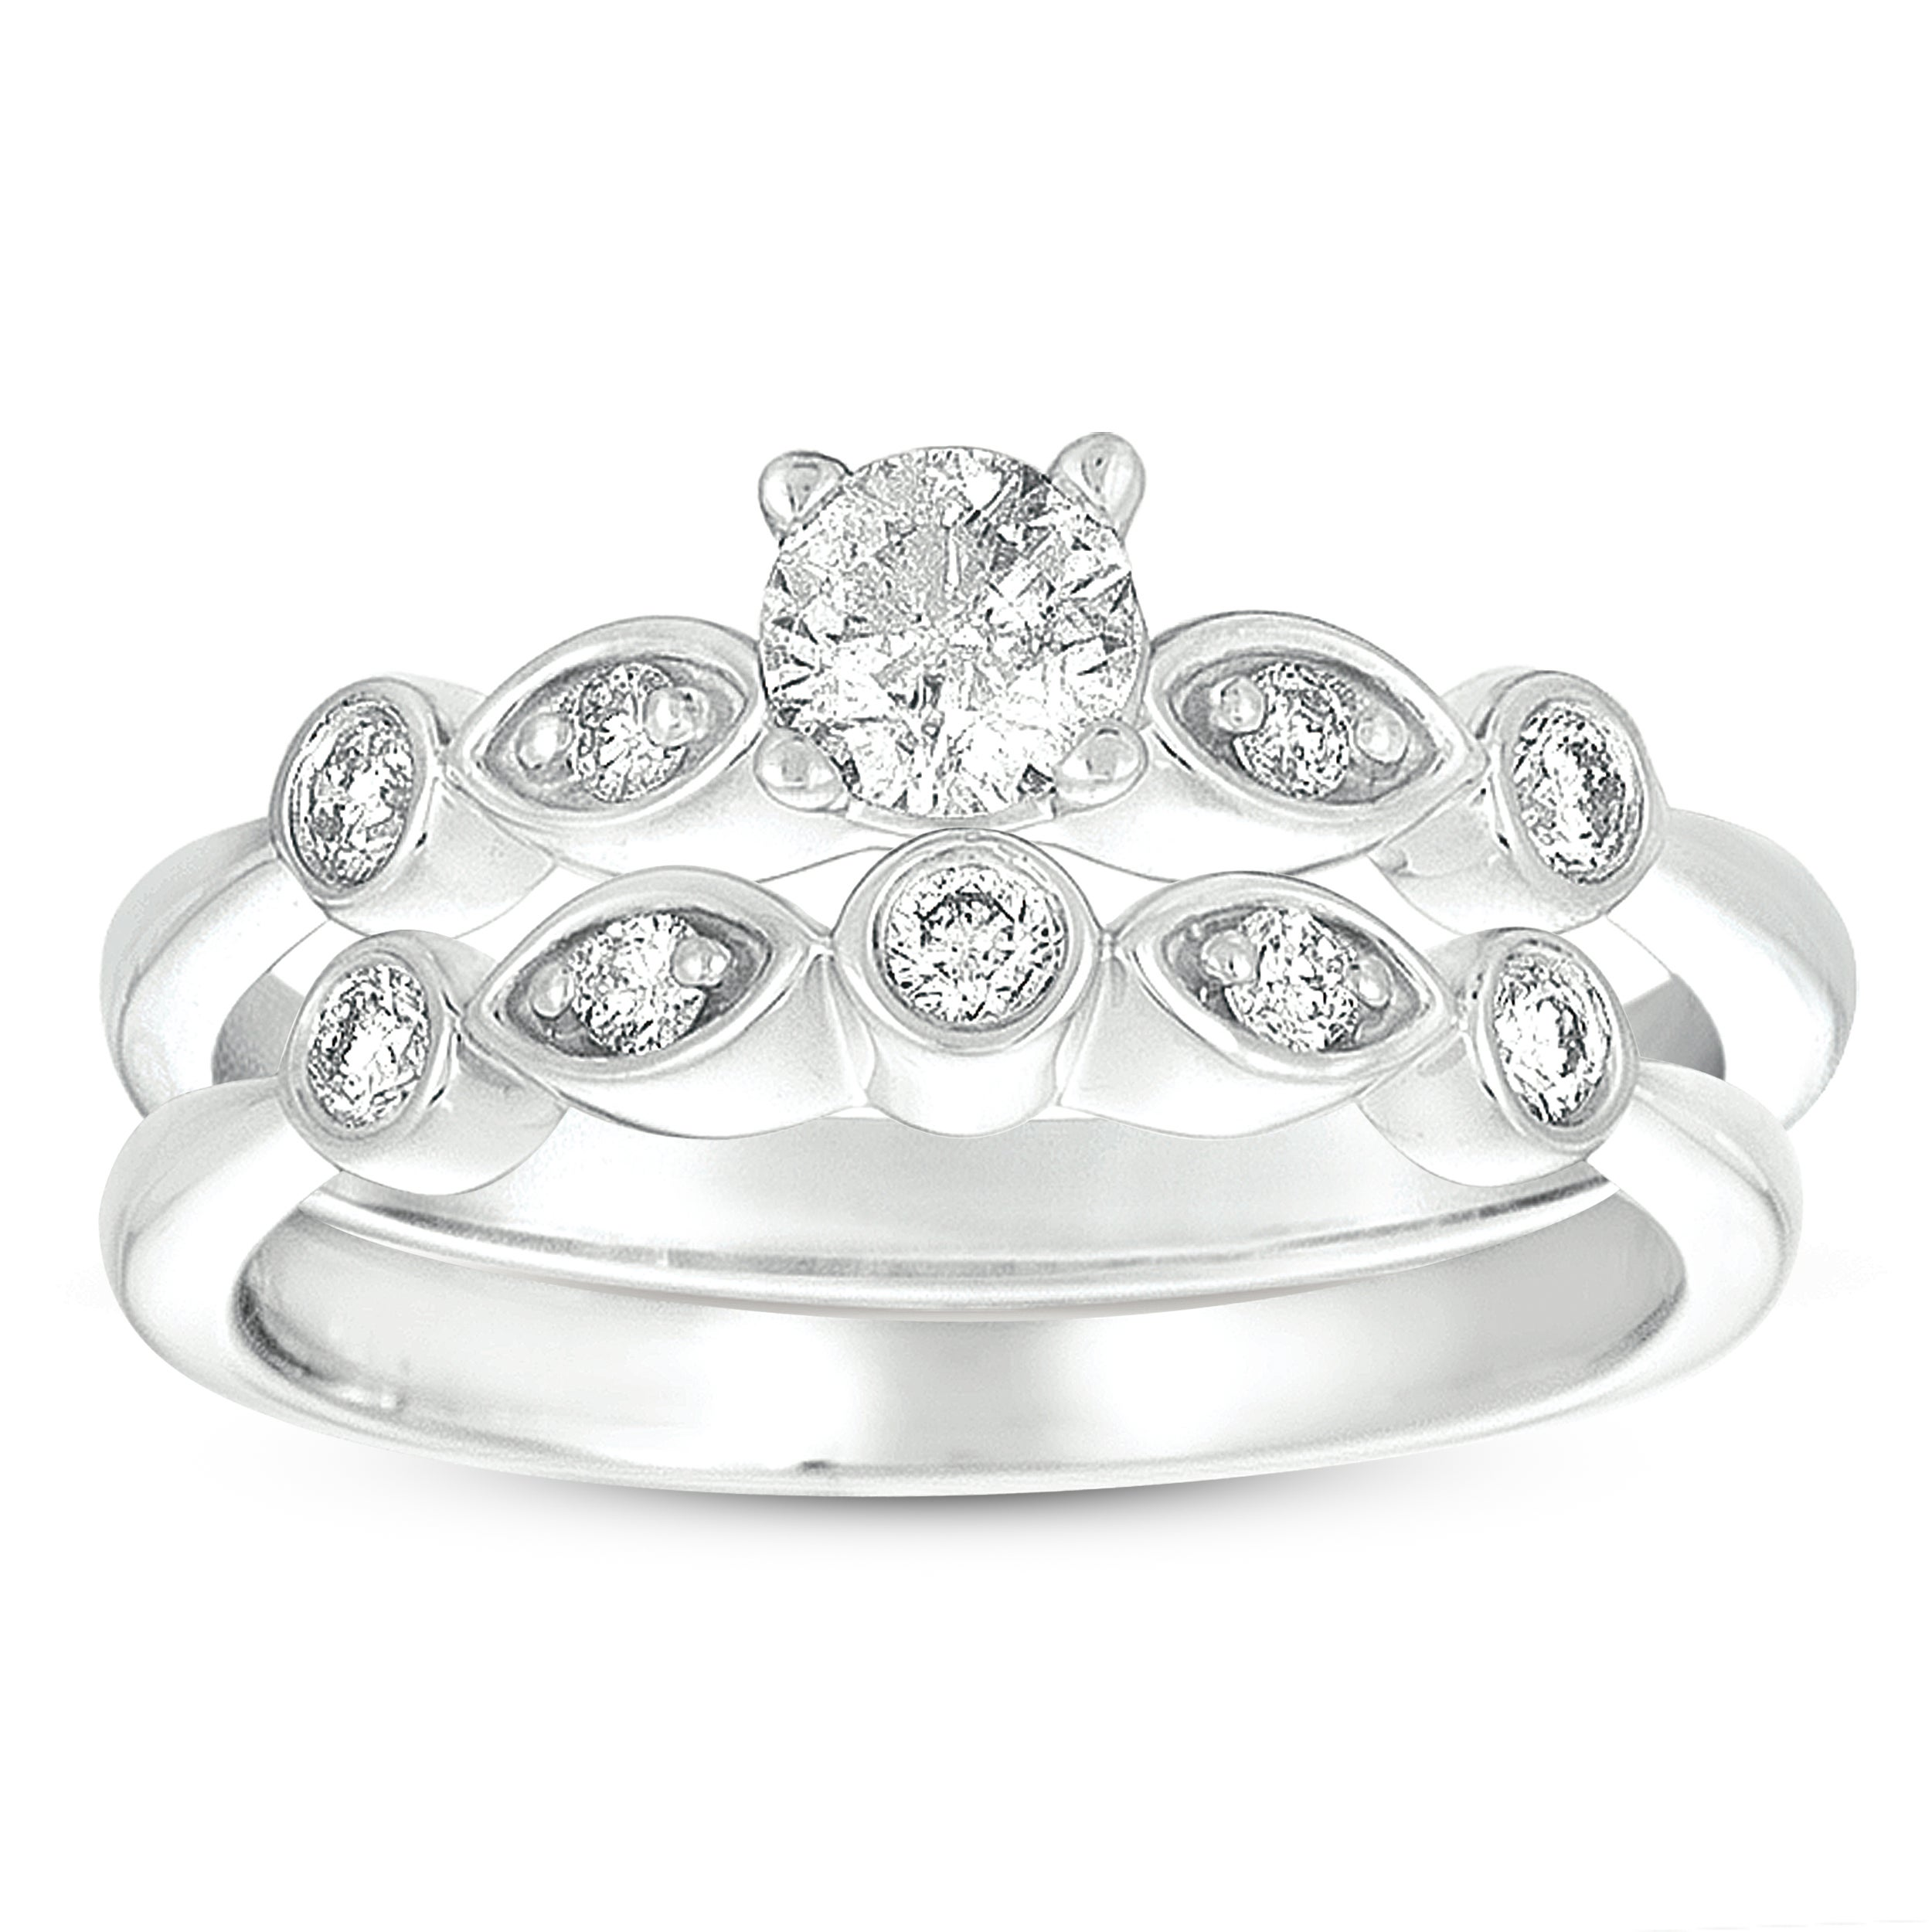 Eloquence 14k White Gold 3/8ct TDW Diamond Bridal Set